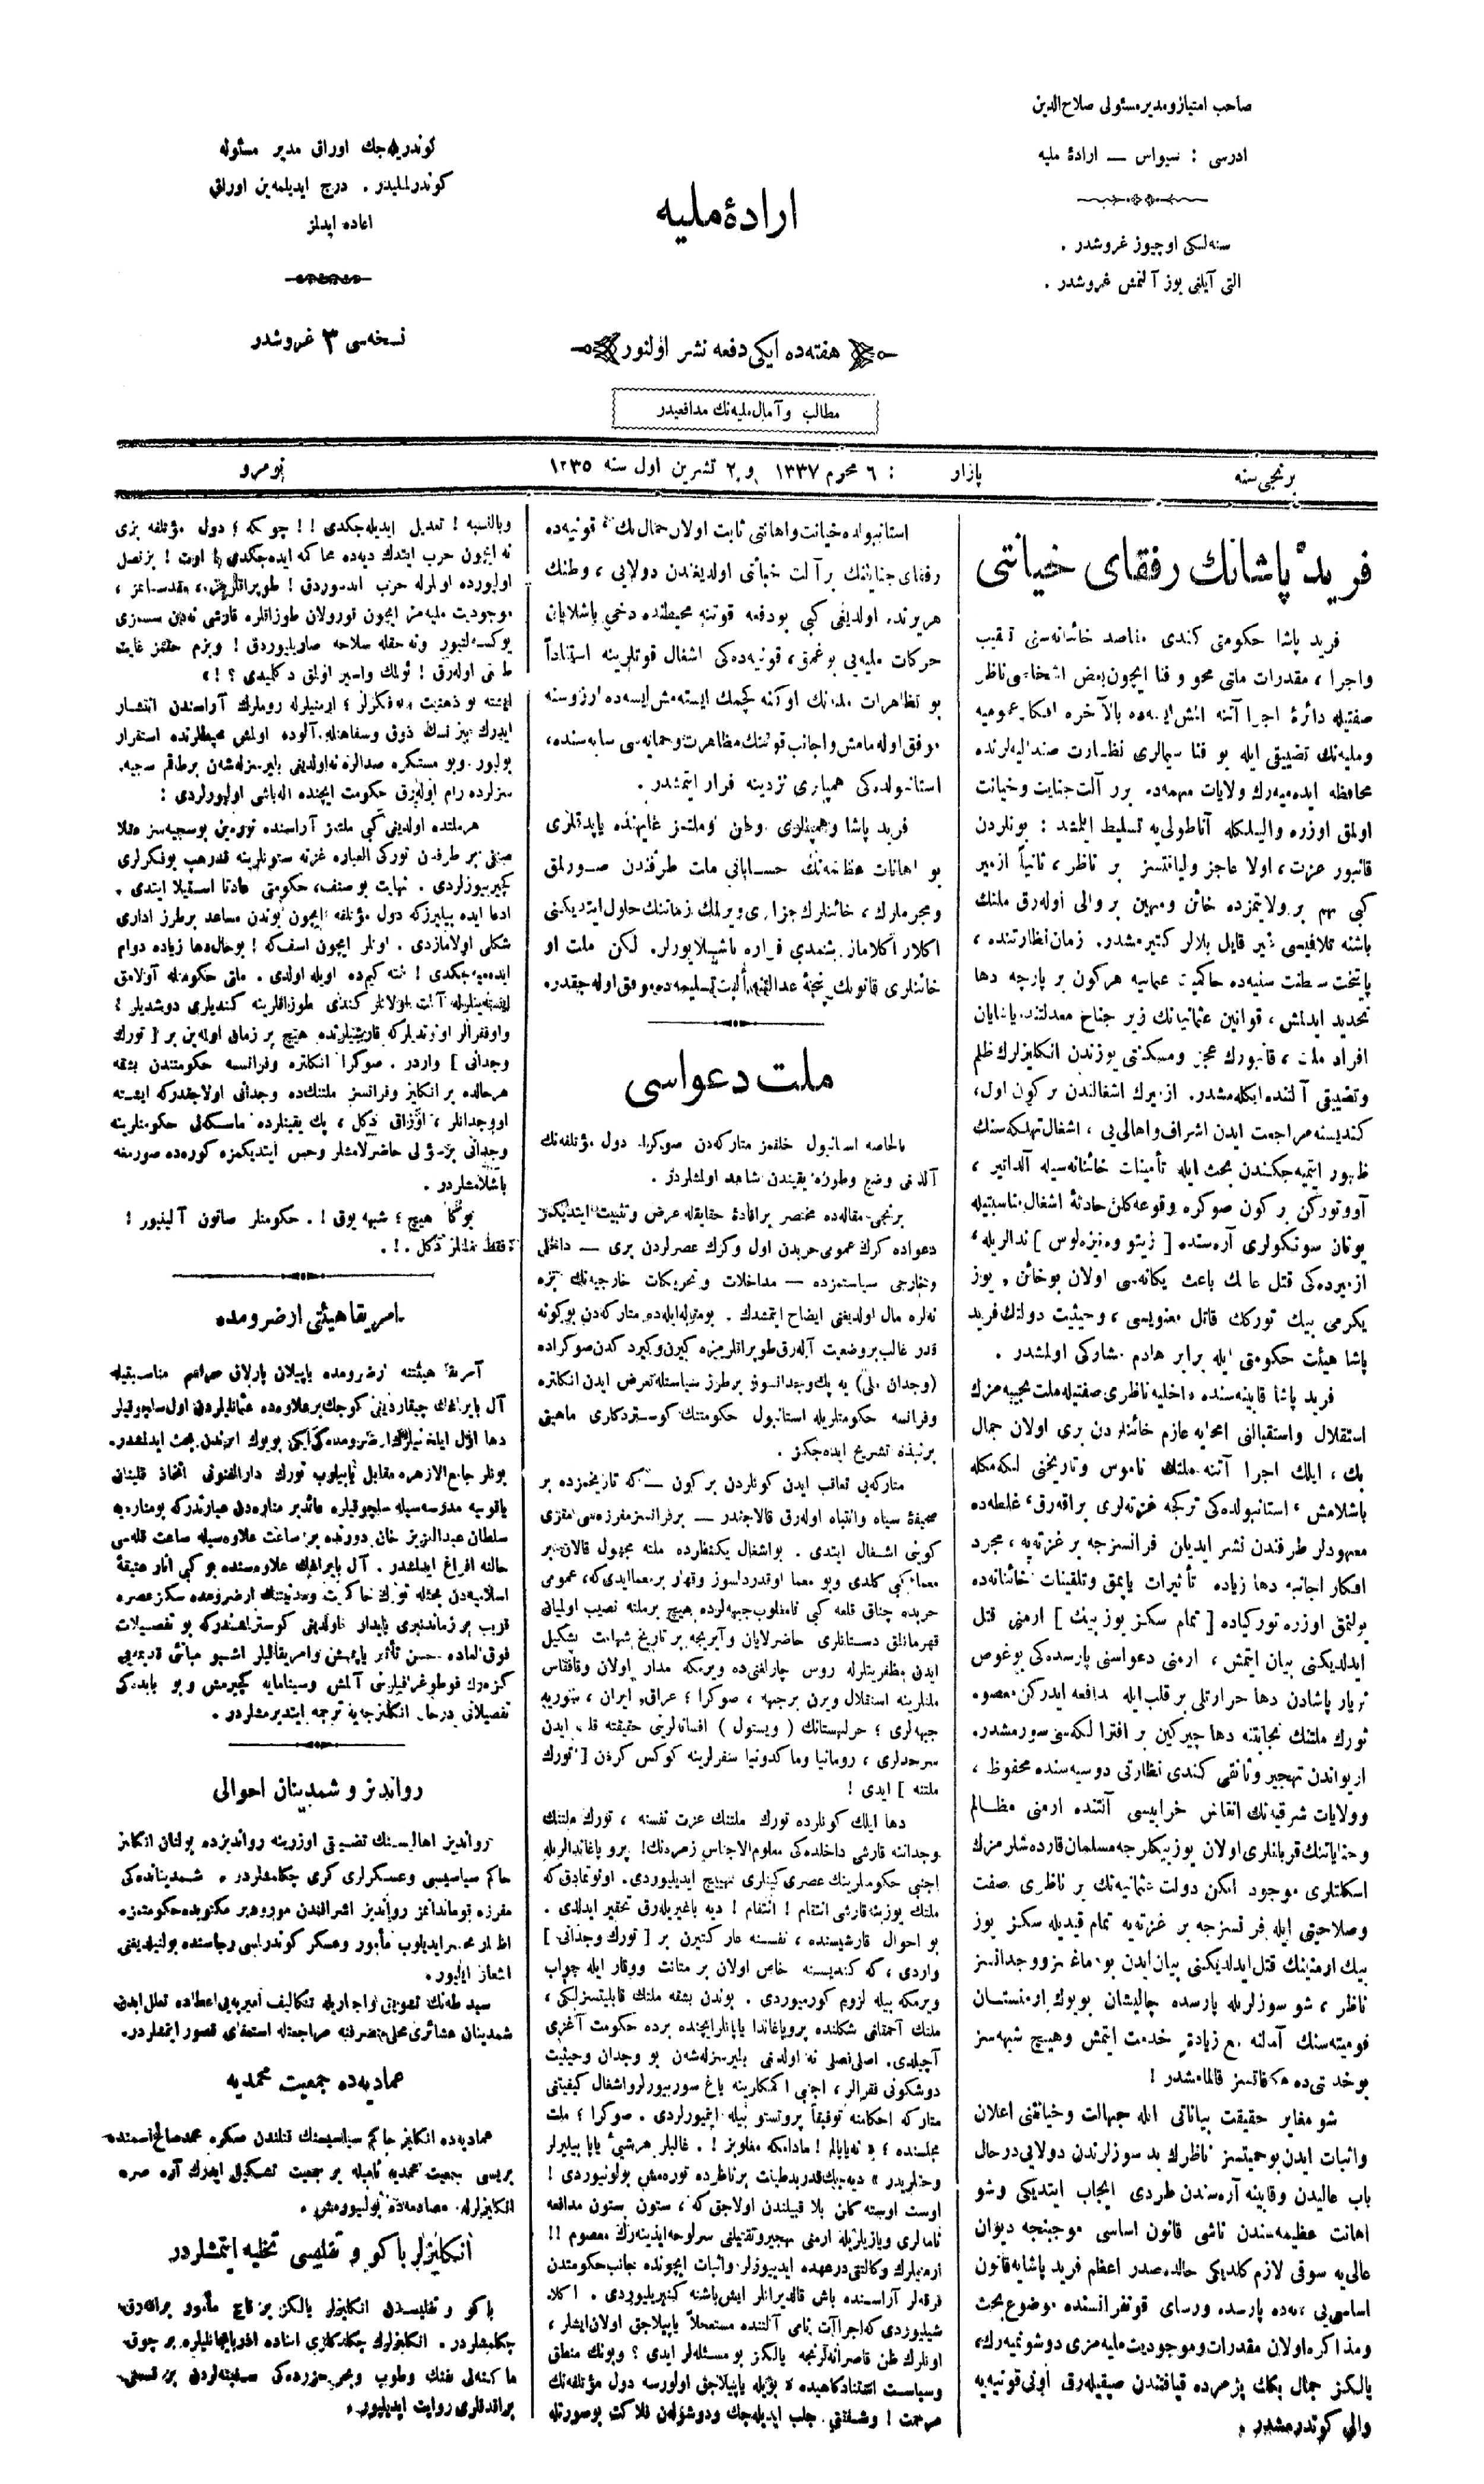 2 Ekim 1919 Tarihli İrade-i Milliye (Sivas) Gazetesi Sayfa 1